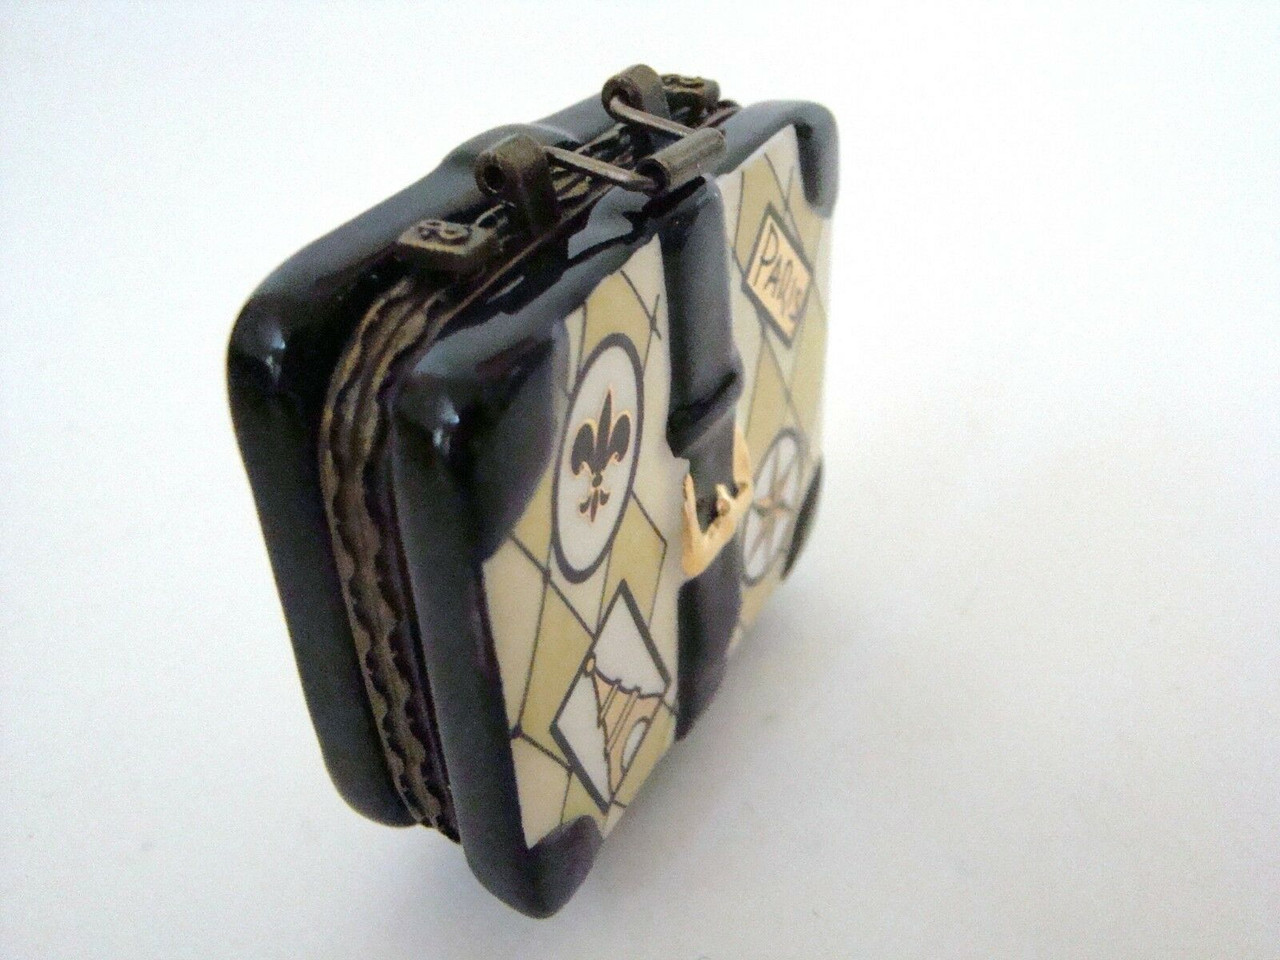 Mud Pie Porcelain Paris Luggage Porcelain Hinged Box